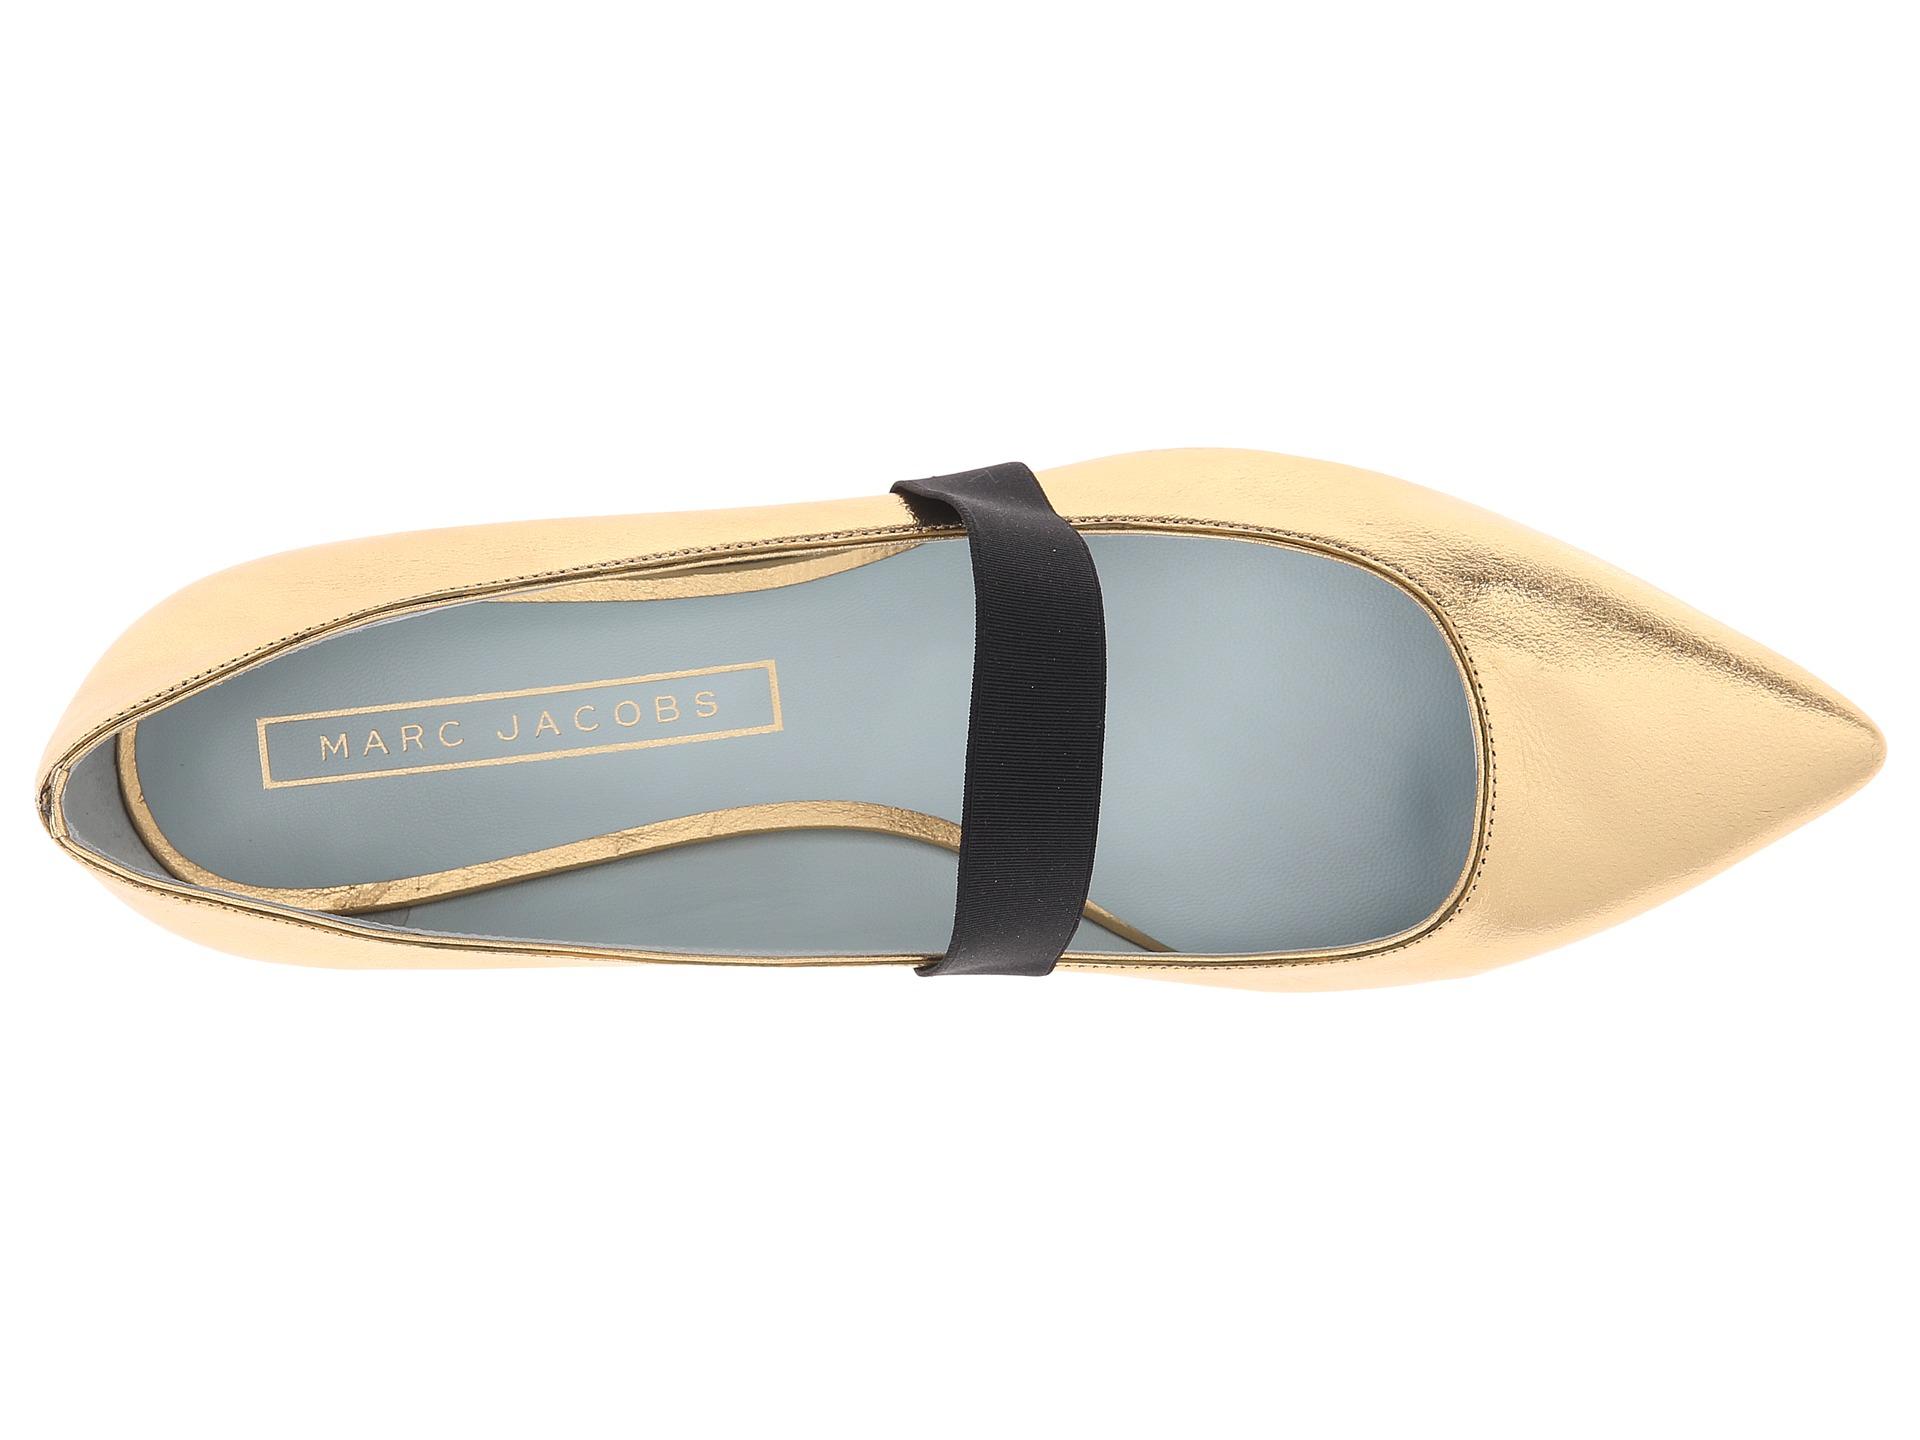 Marc Jacobs HALSEY women's Shoes (Pumps / Ballerinas) in 2018 New Sale Online 7N6wgE